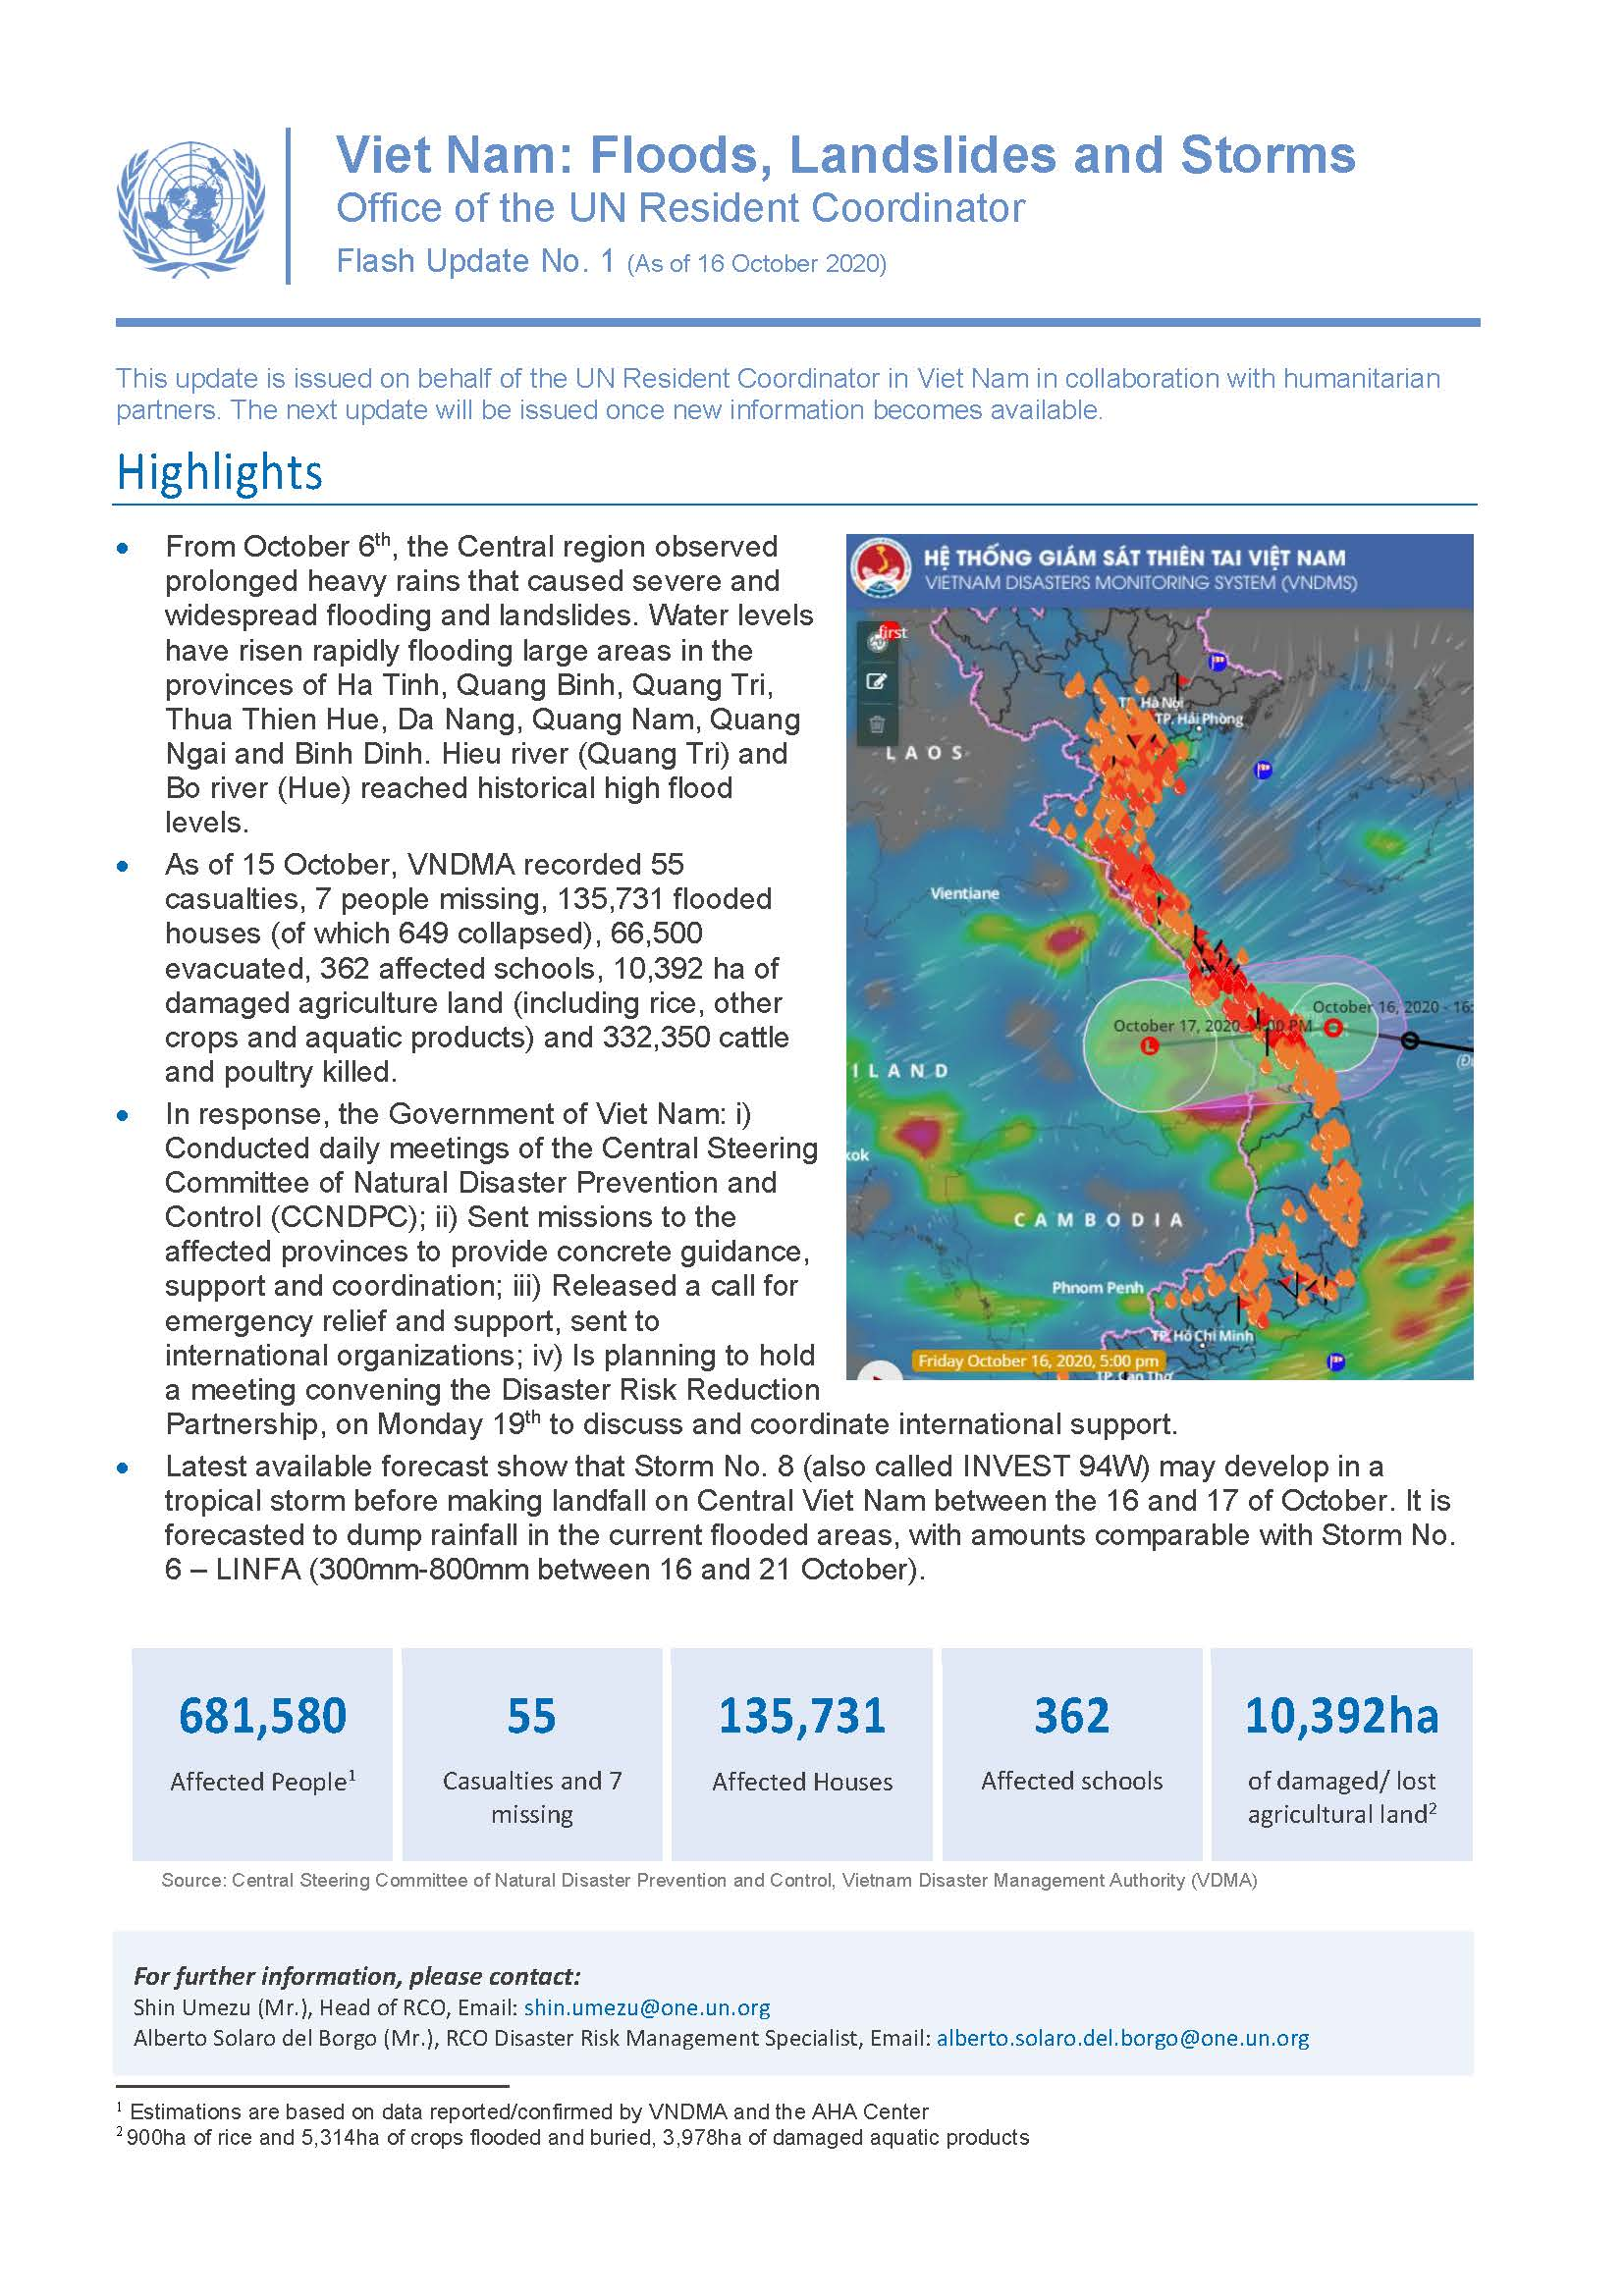 Viet Nam: Floods Landslides and Storms Flash Update No. 1 As of 1 6 October 20 20